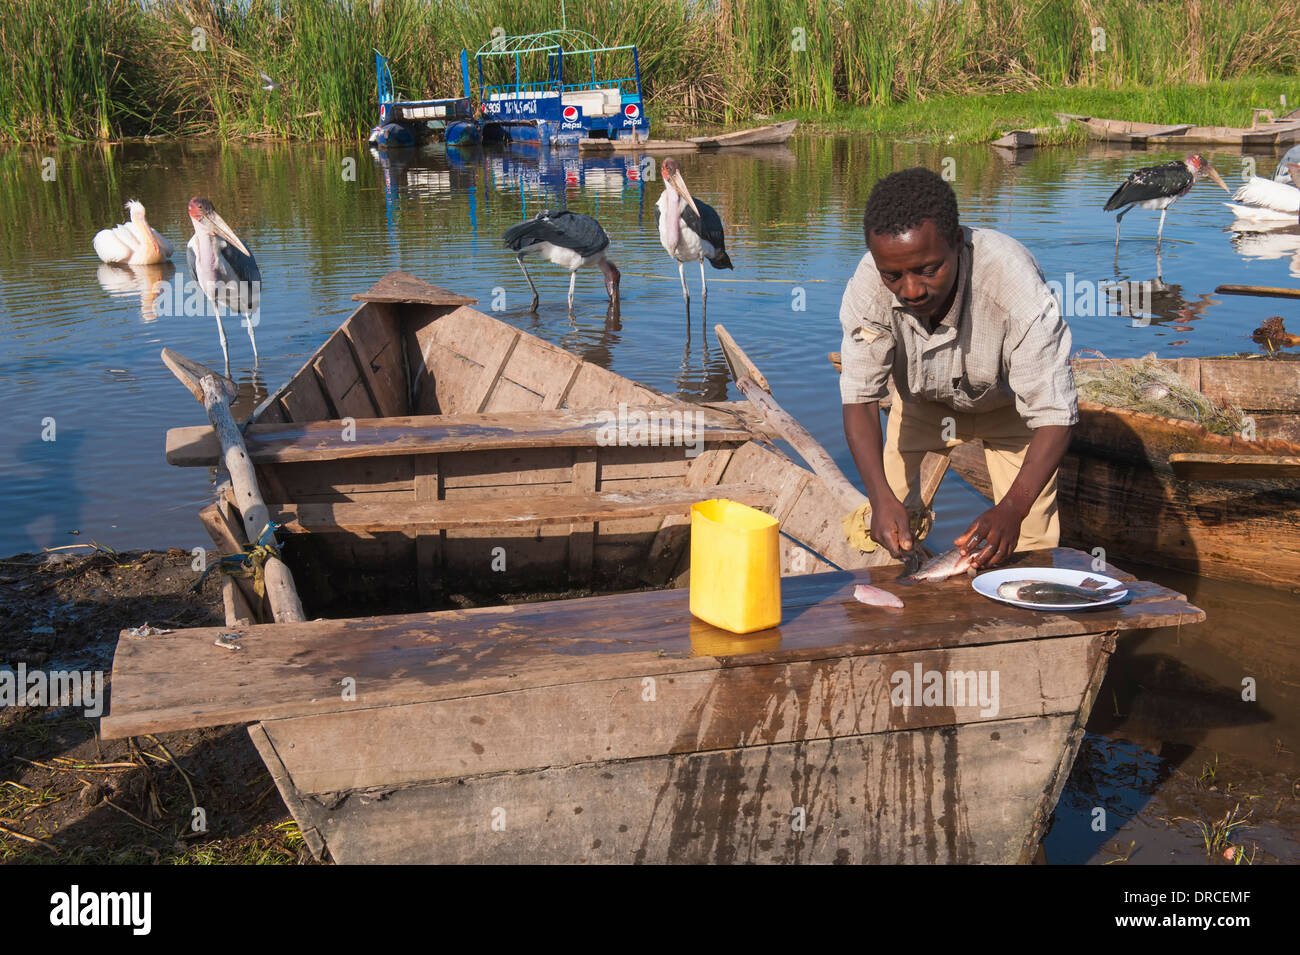 Fisherman cutting fish, Awasa, Ethiopia - Stock Image